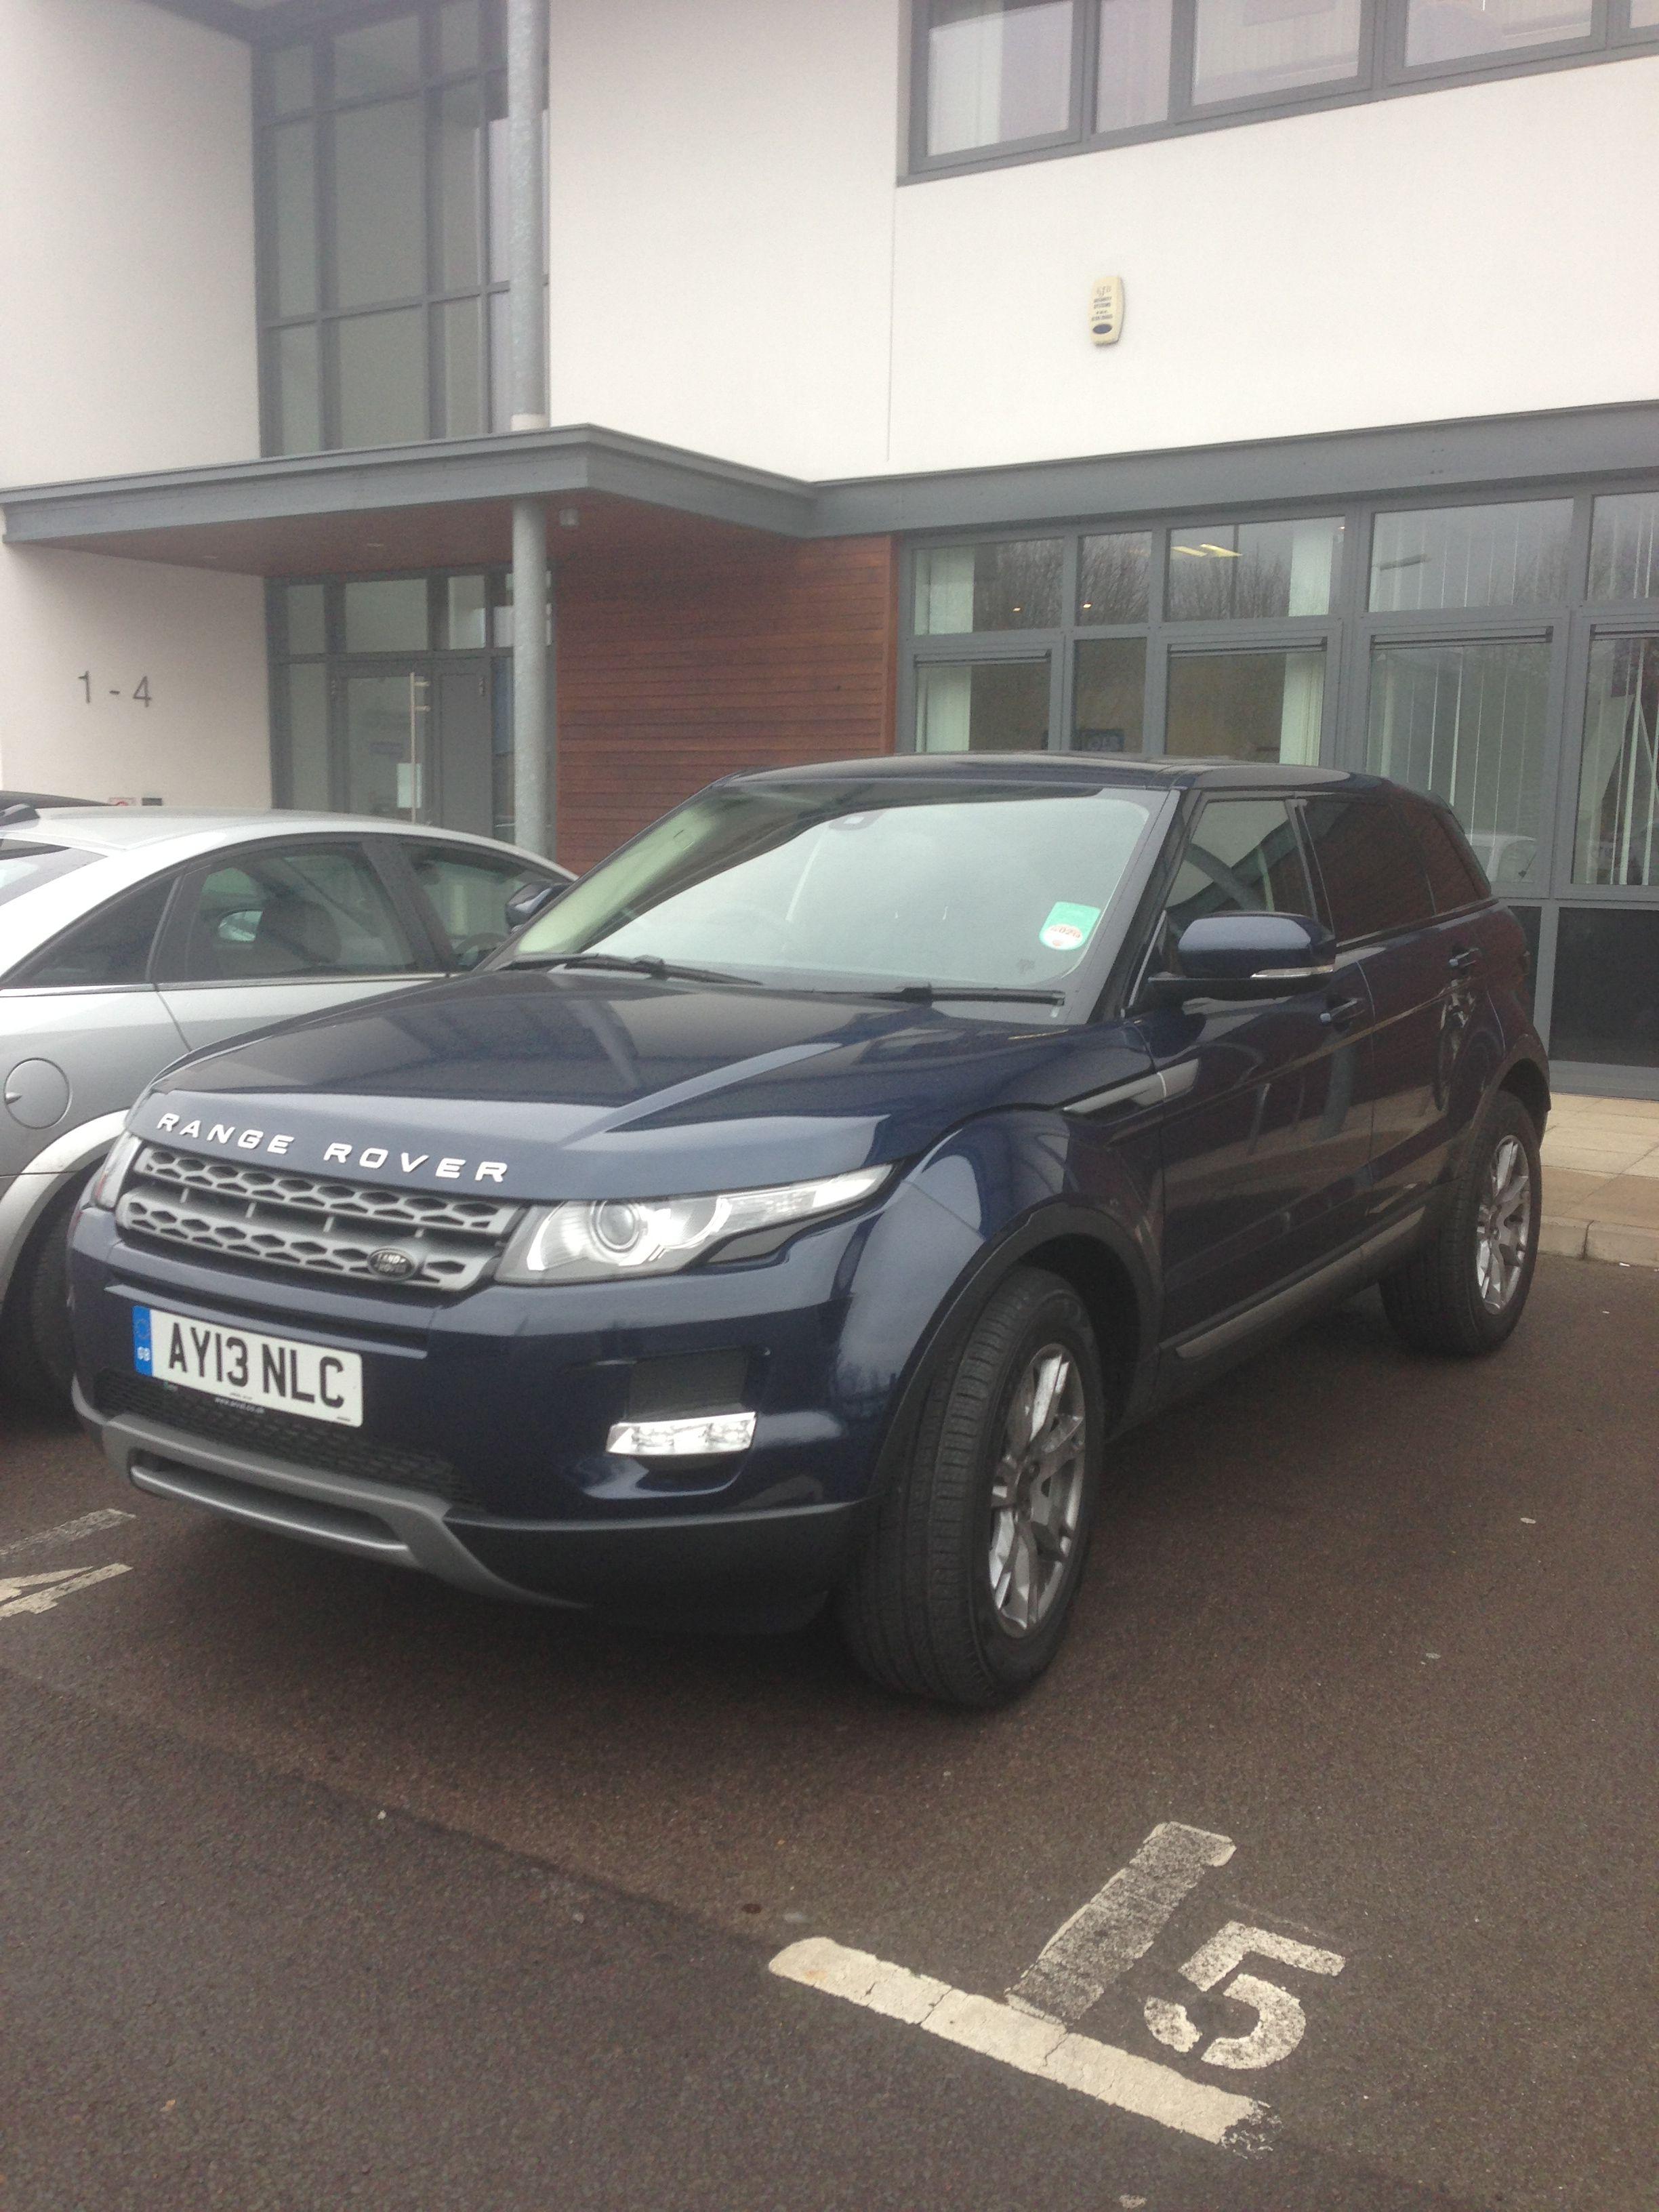 Range Rover Sports cars for sale, Range rover sport